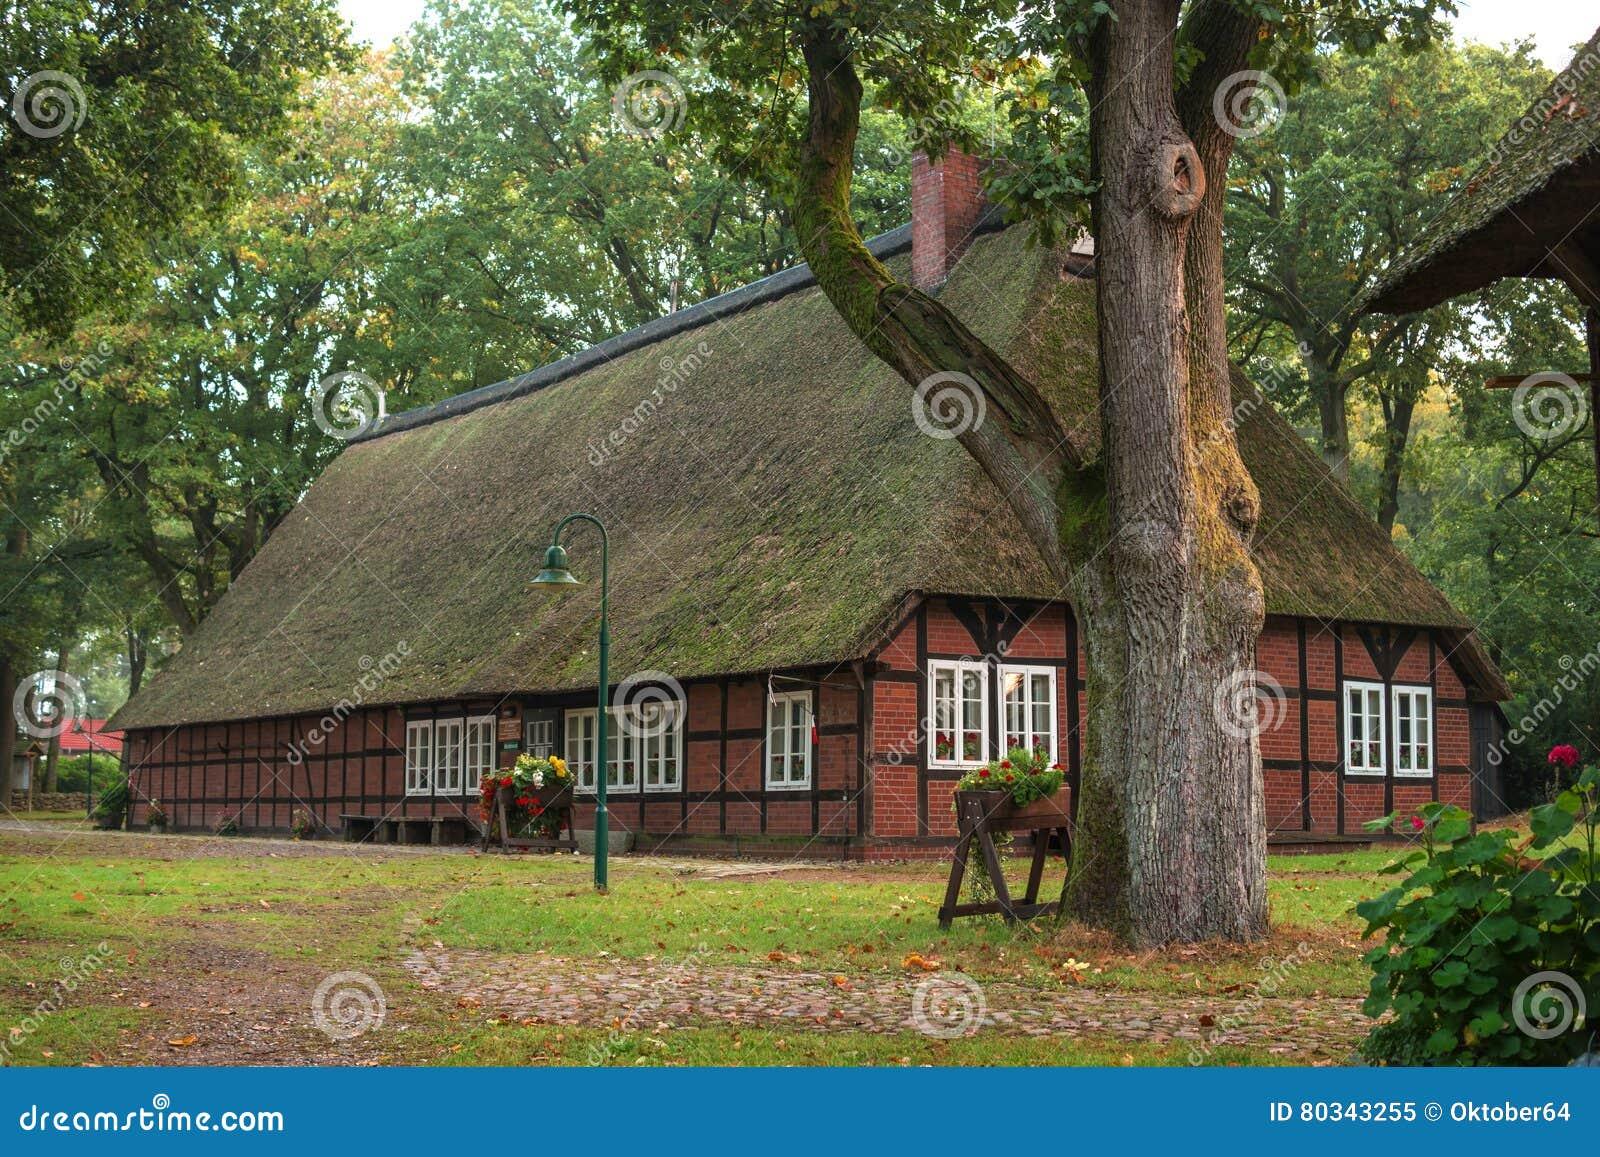 Schneverdinge, Germany - October 10, 2016: Village Museum Heimathaus ...